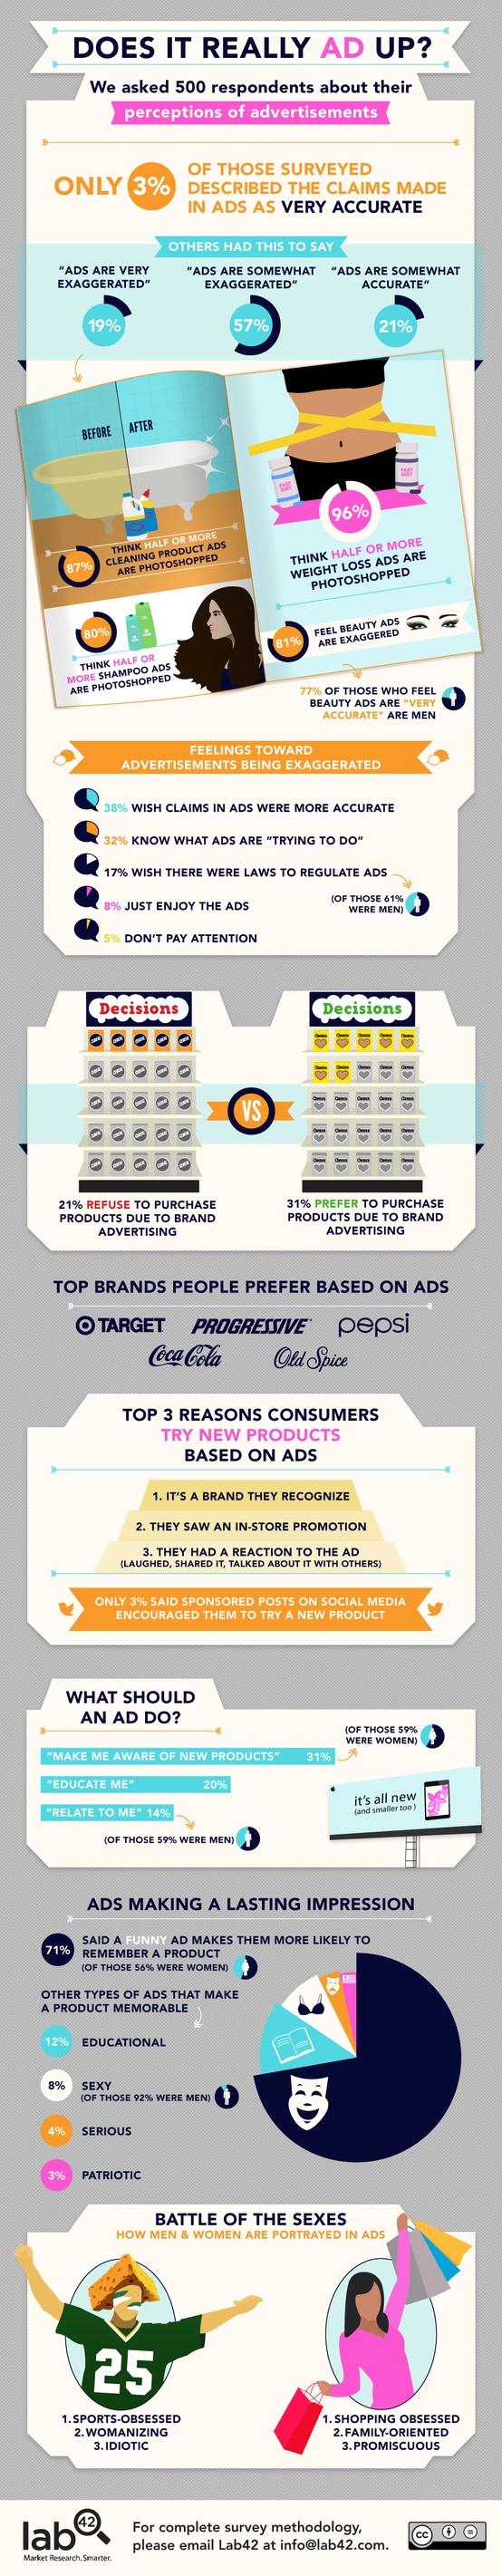 Advertisements_perceptions